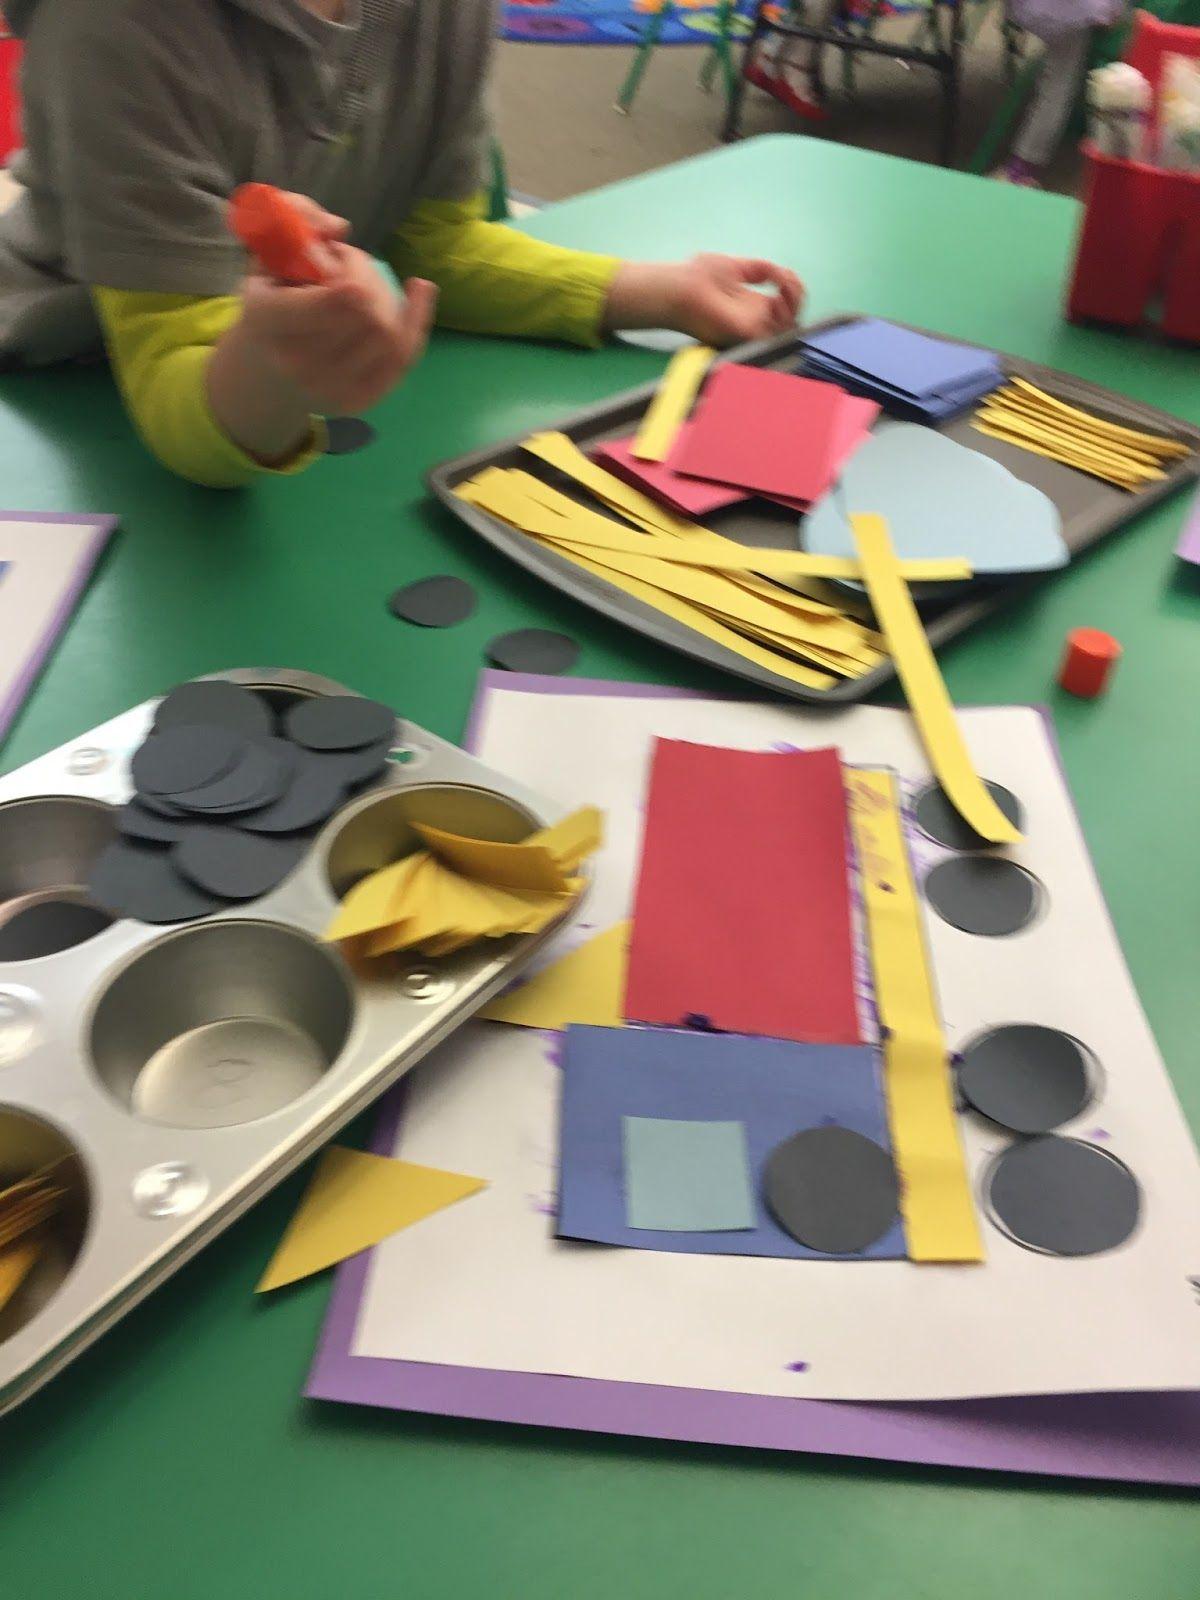 Fantastic Shape Craft For Your Construction Theme Perfect For Preschool Prek Kindergarten